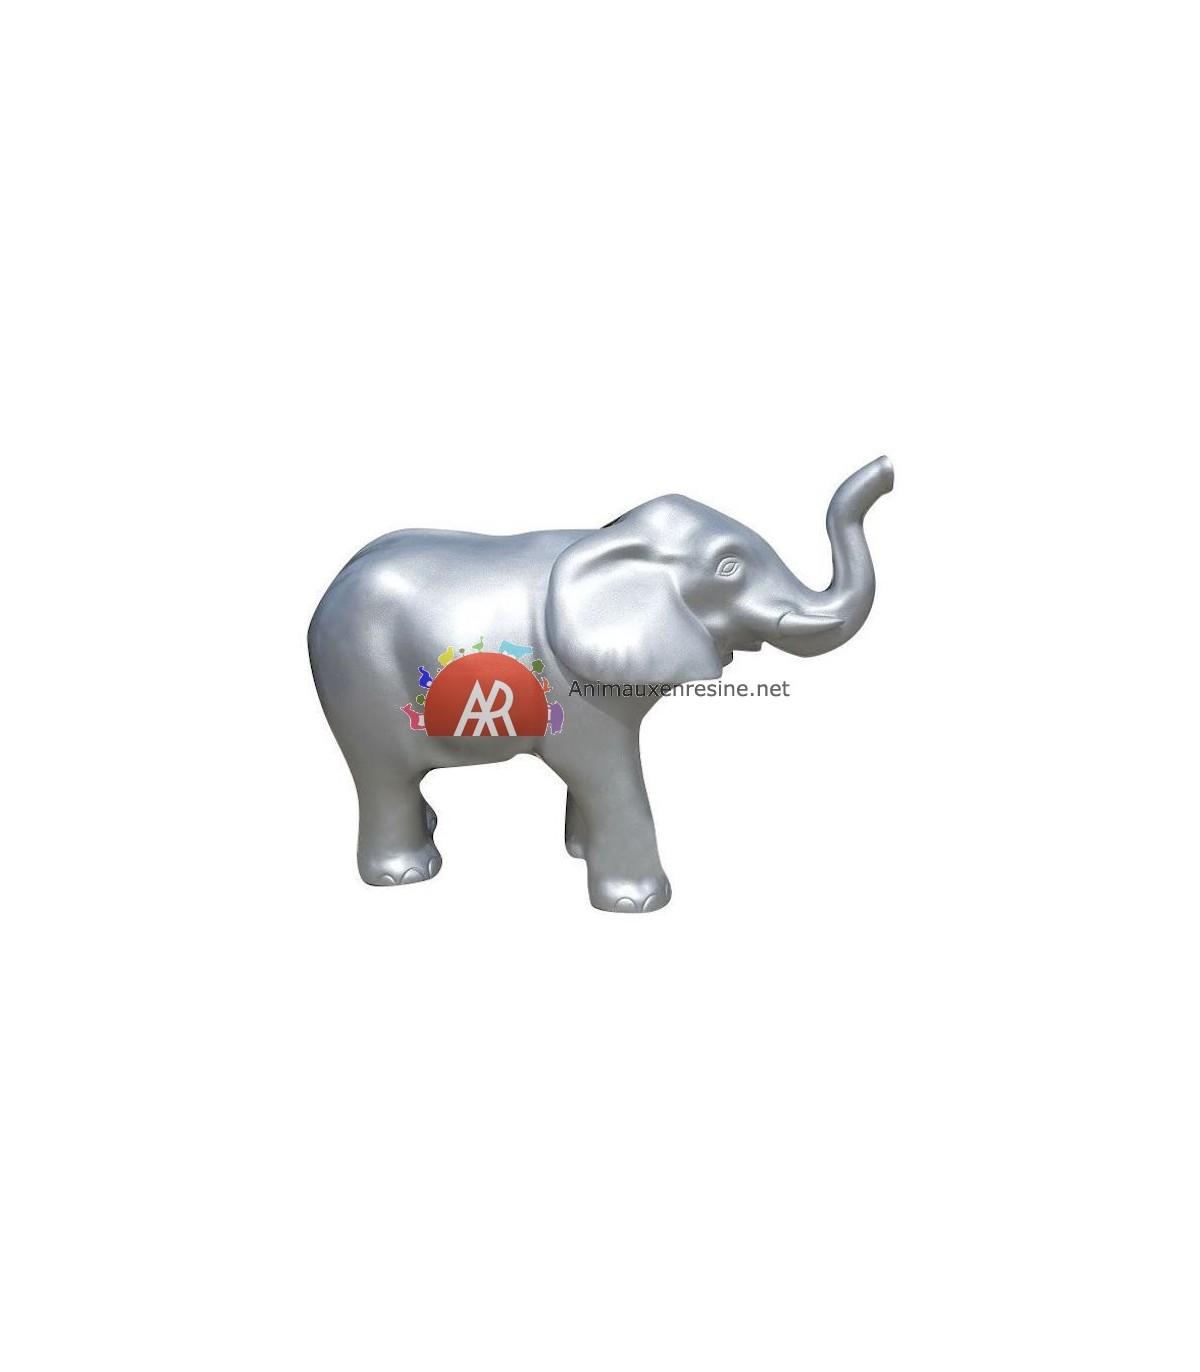 statue pour jardin elephant trompe relevee moyen mod le en r sine animauxenresine net. Black Bedroom Furniture Sets. Home Design Ideas